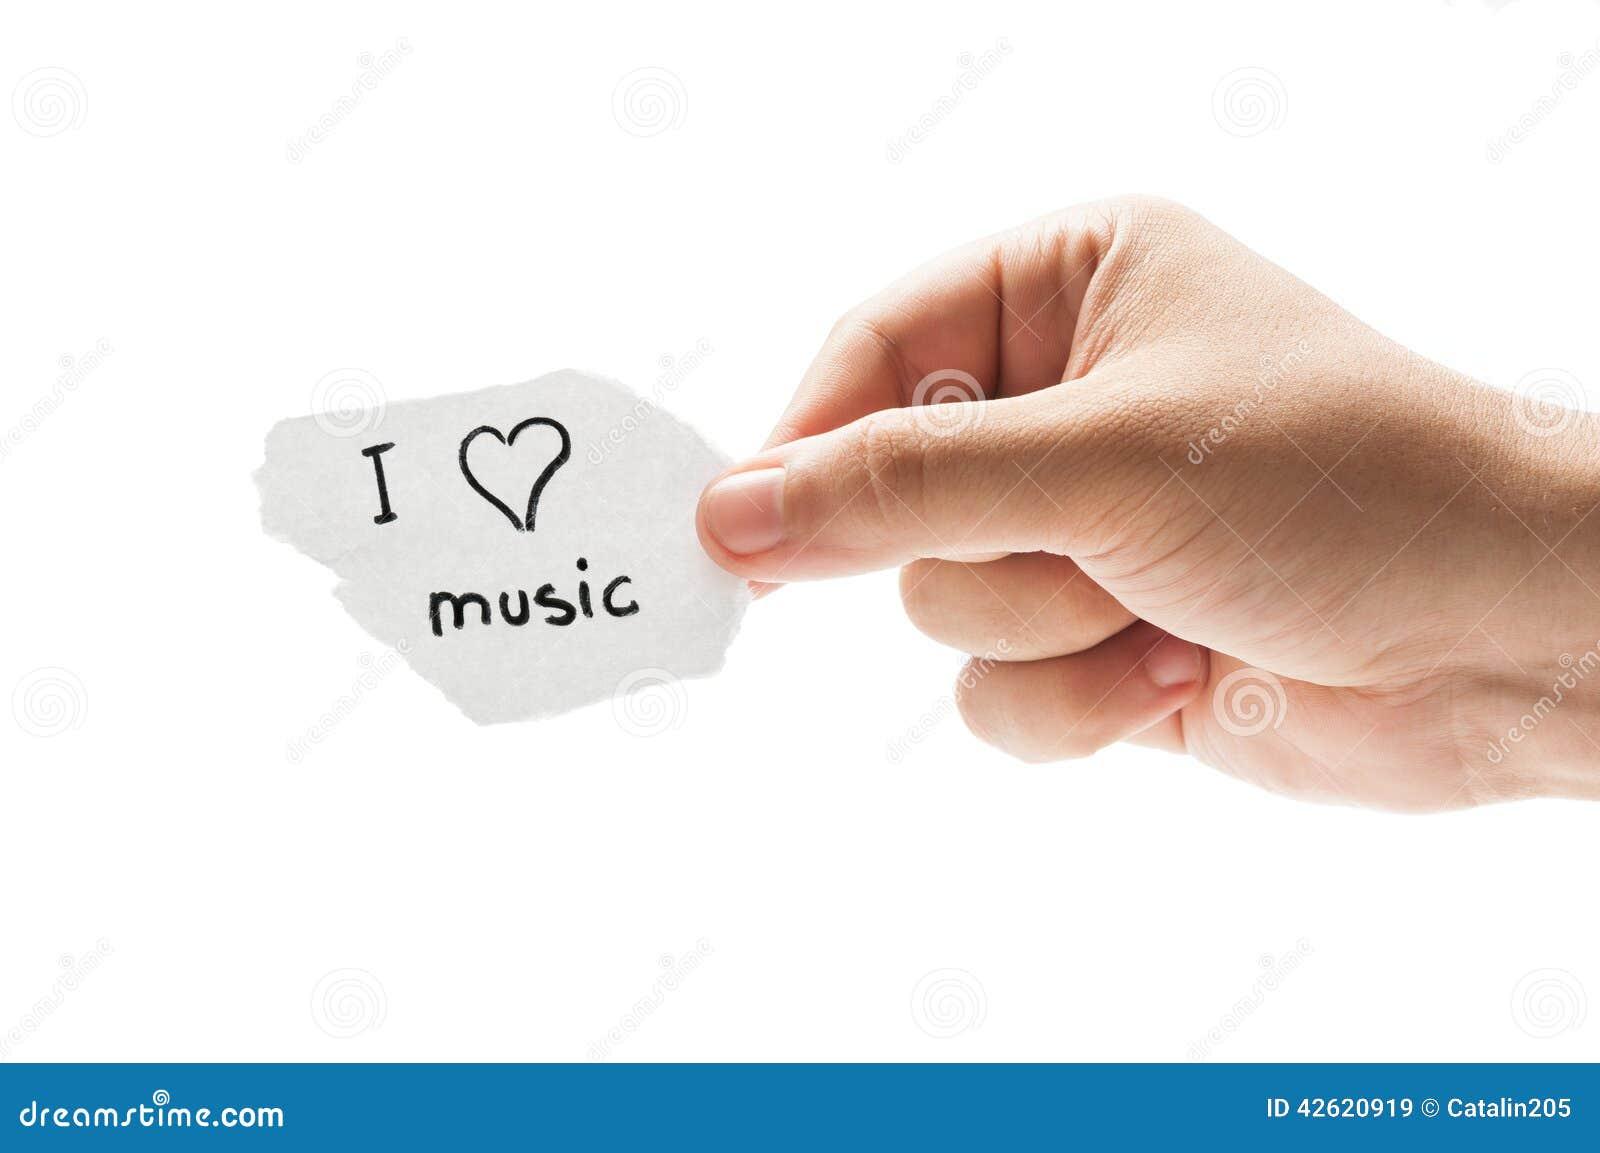 love music essay